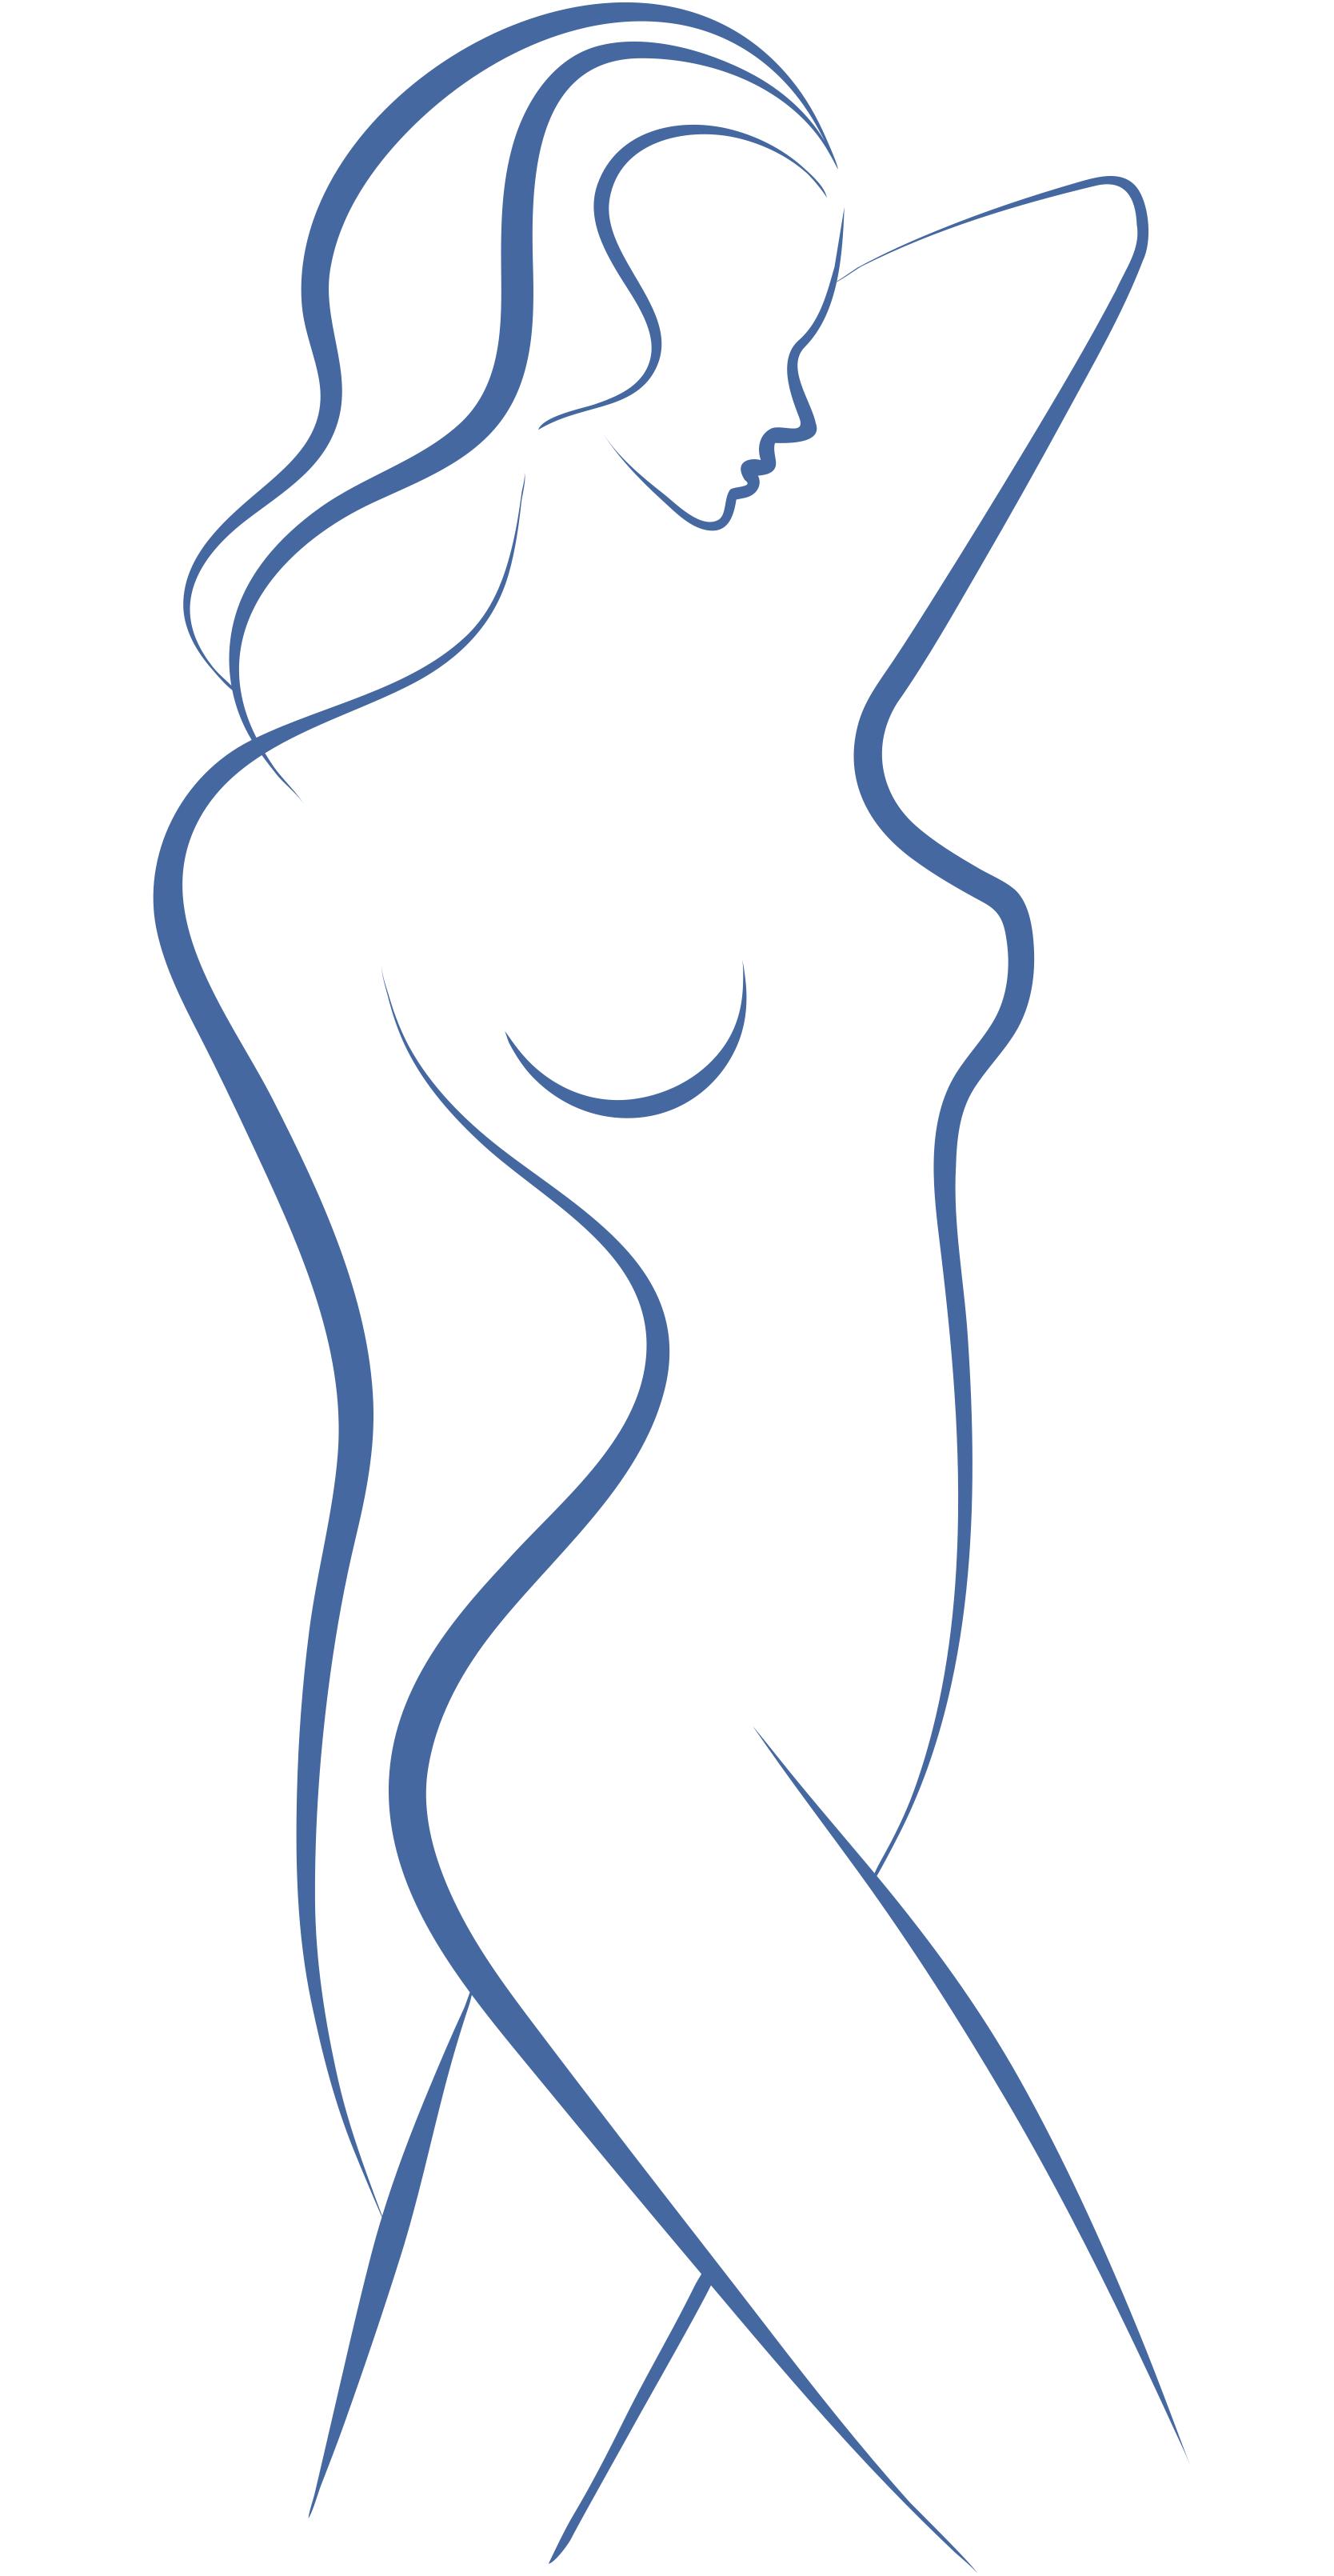 Sketch of Female Body in Blue